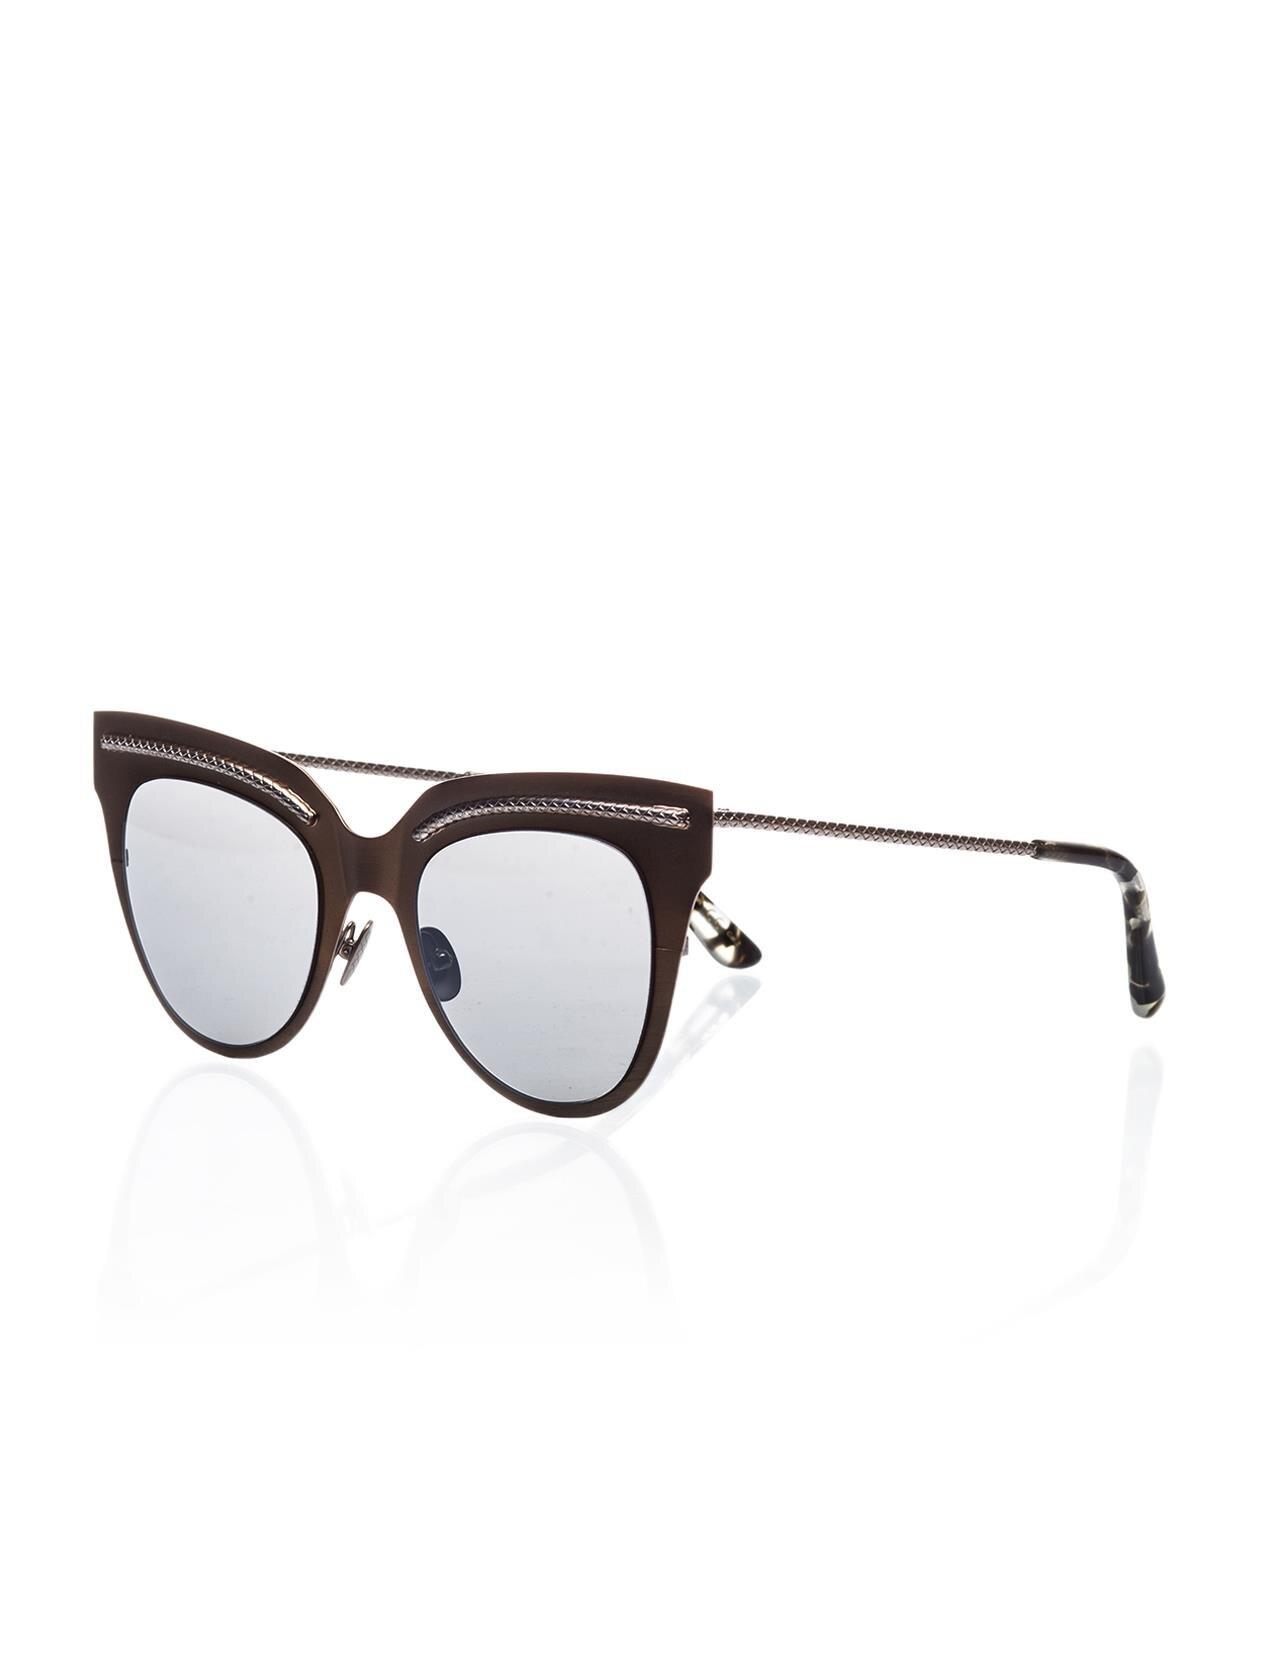 Women's sunglasses b.v 0029s 003 metal copper organic oval cat eye 50-22-140 bottega veneta